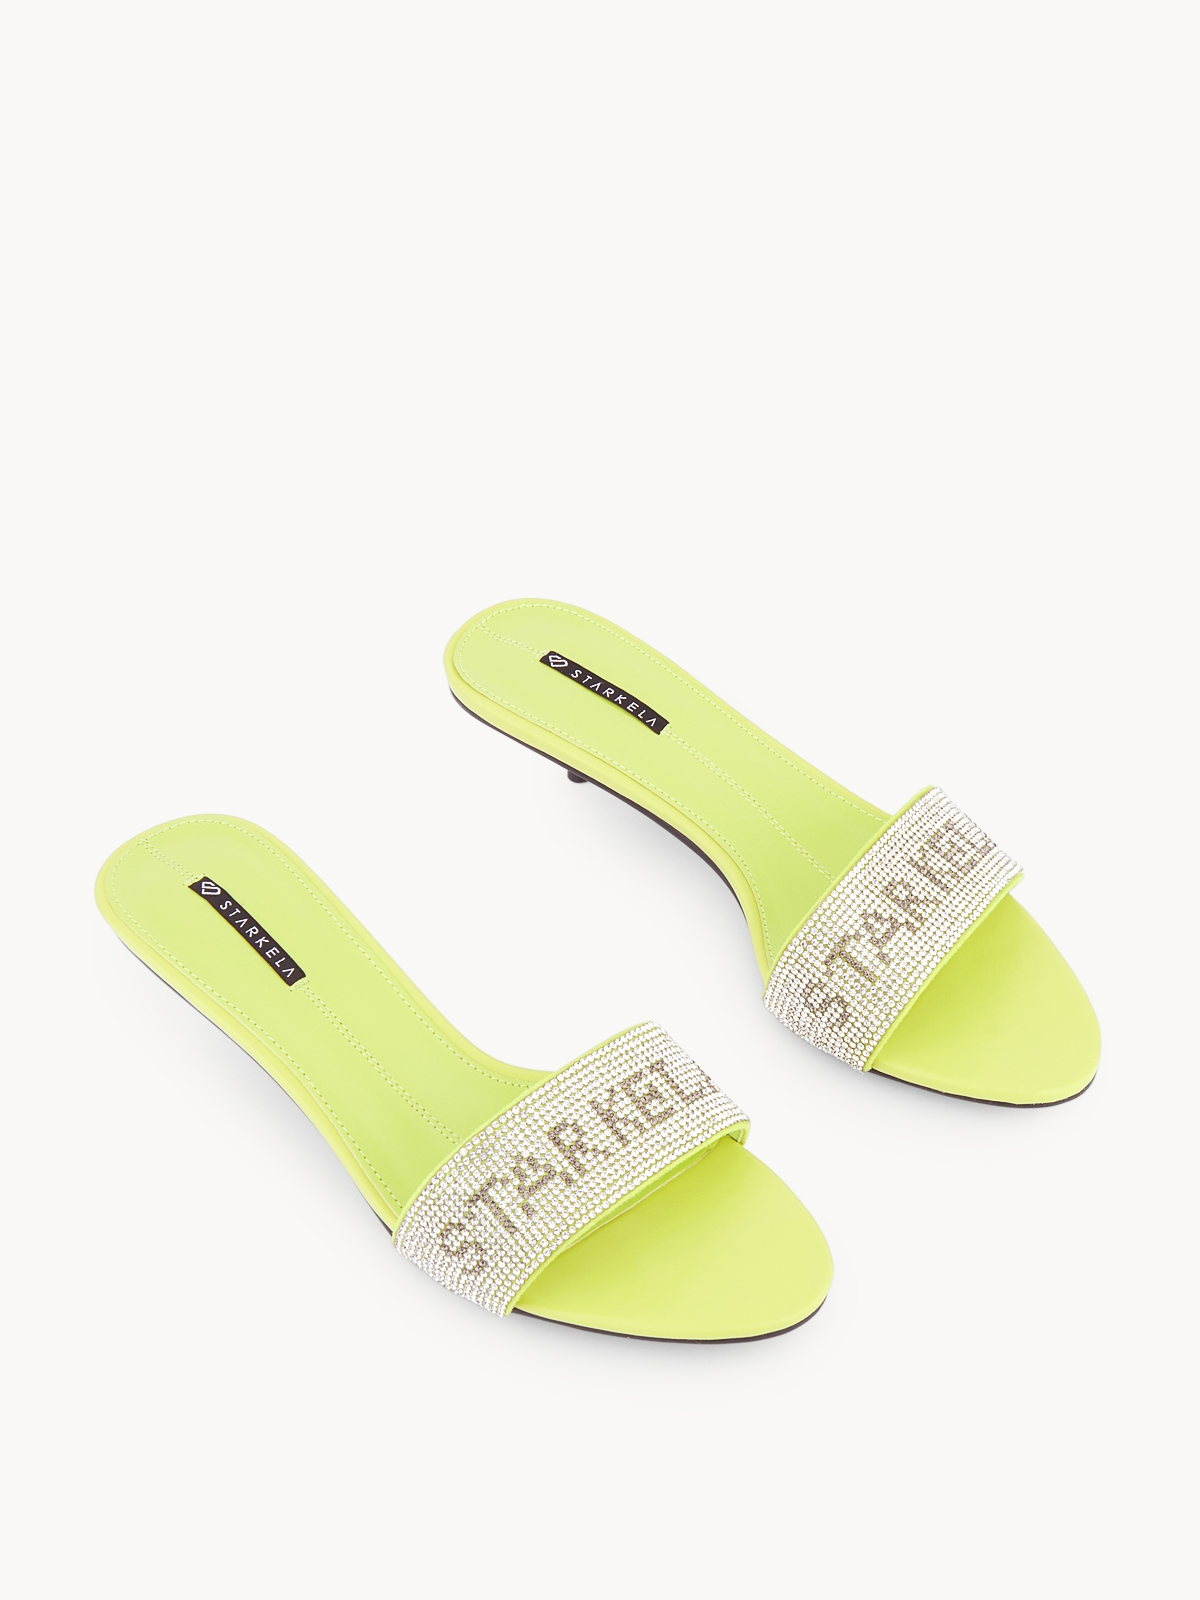 Starkela Flashy Sandal Heels Green